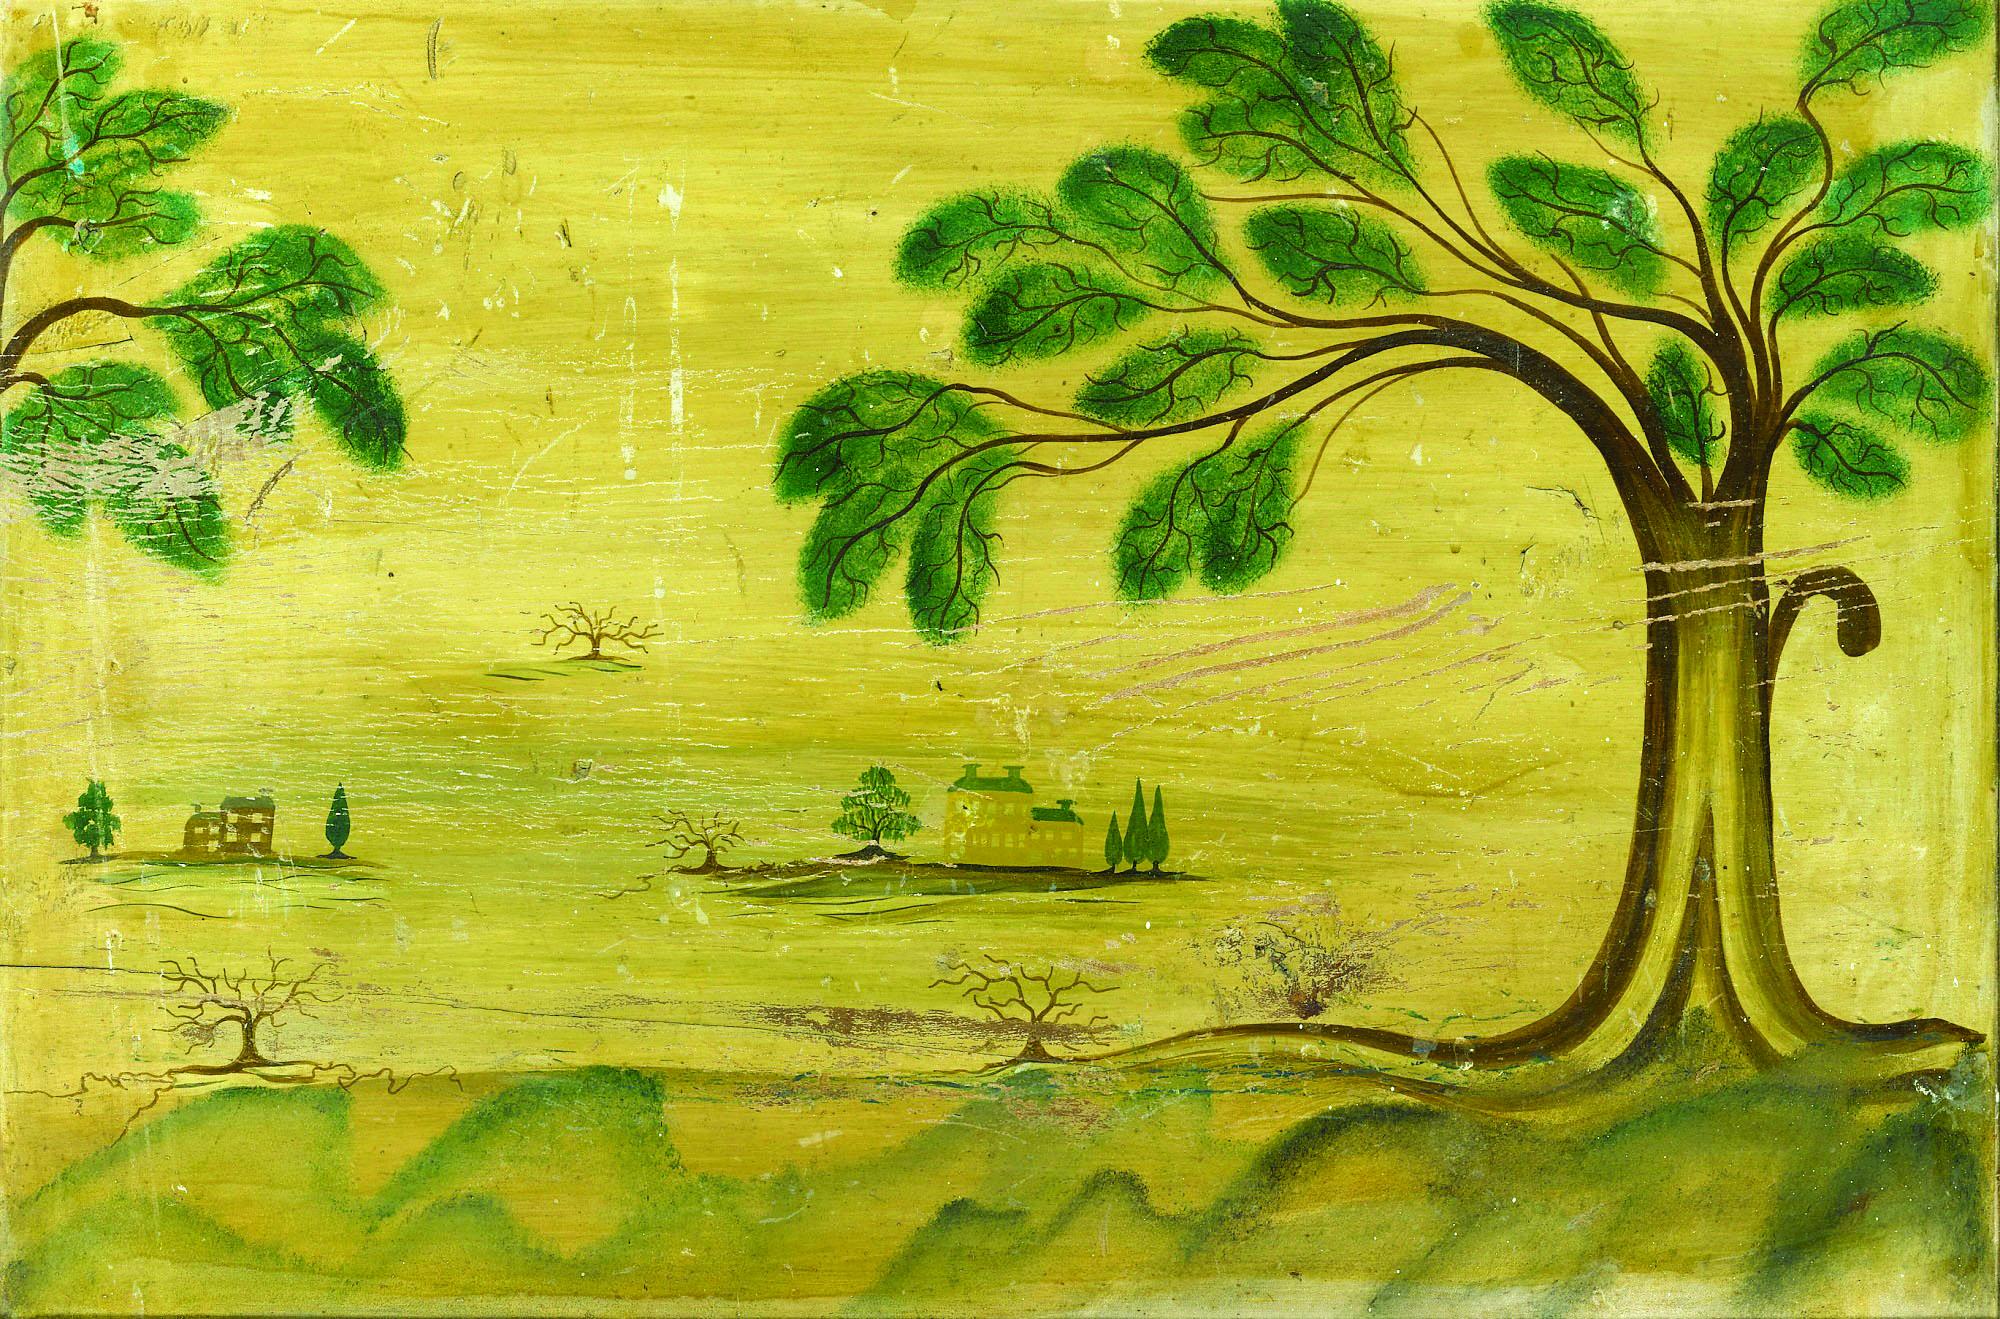 Antique-fireboard-Sothebys-auction_gn